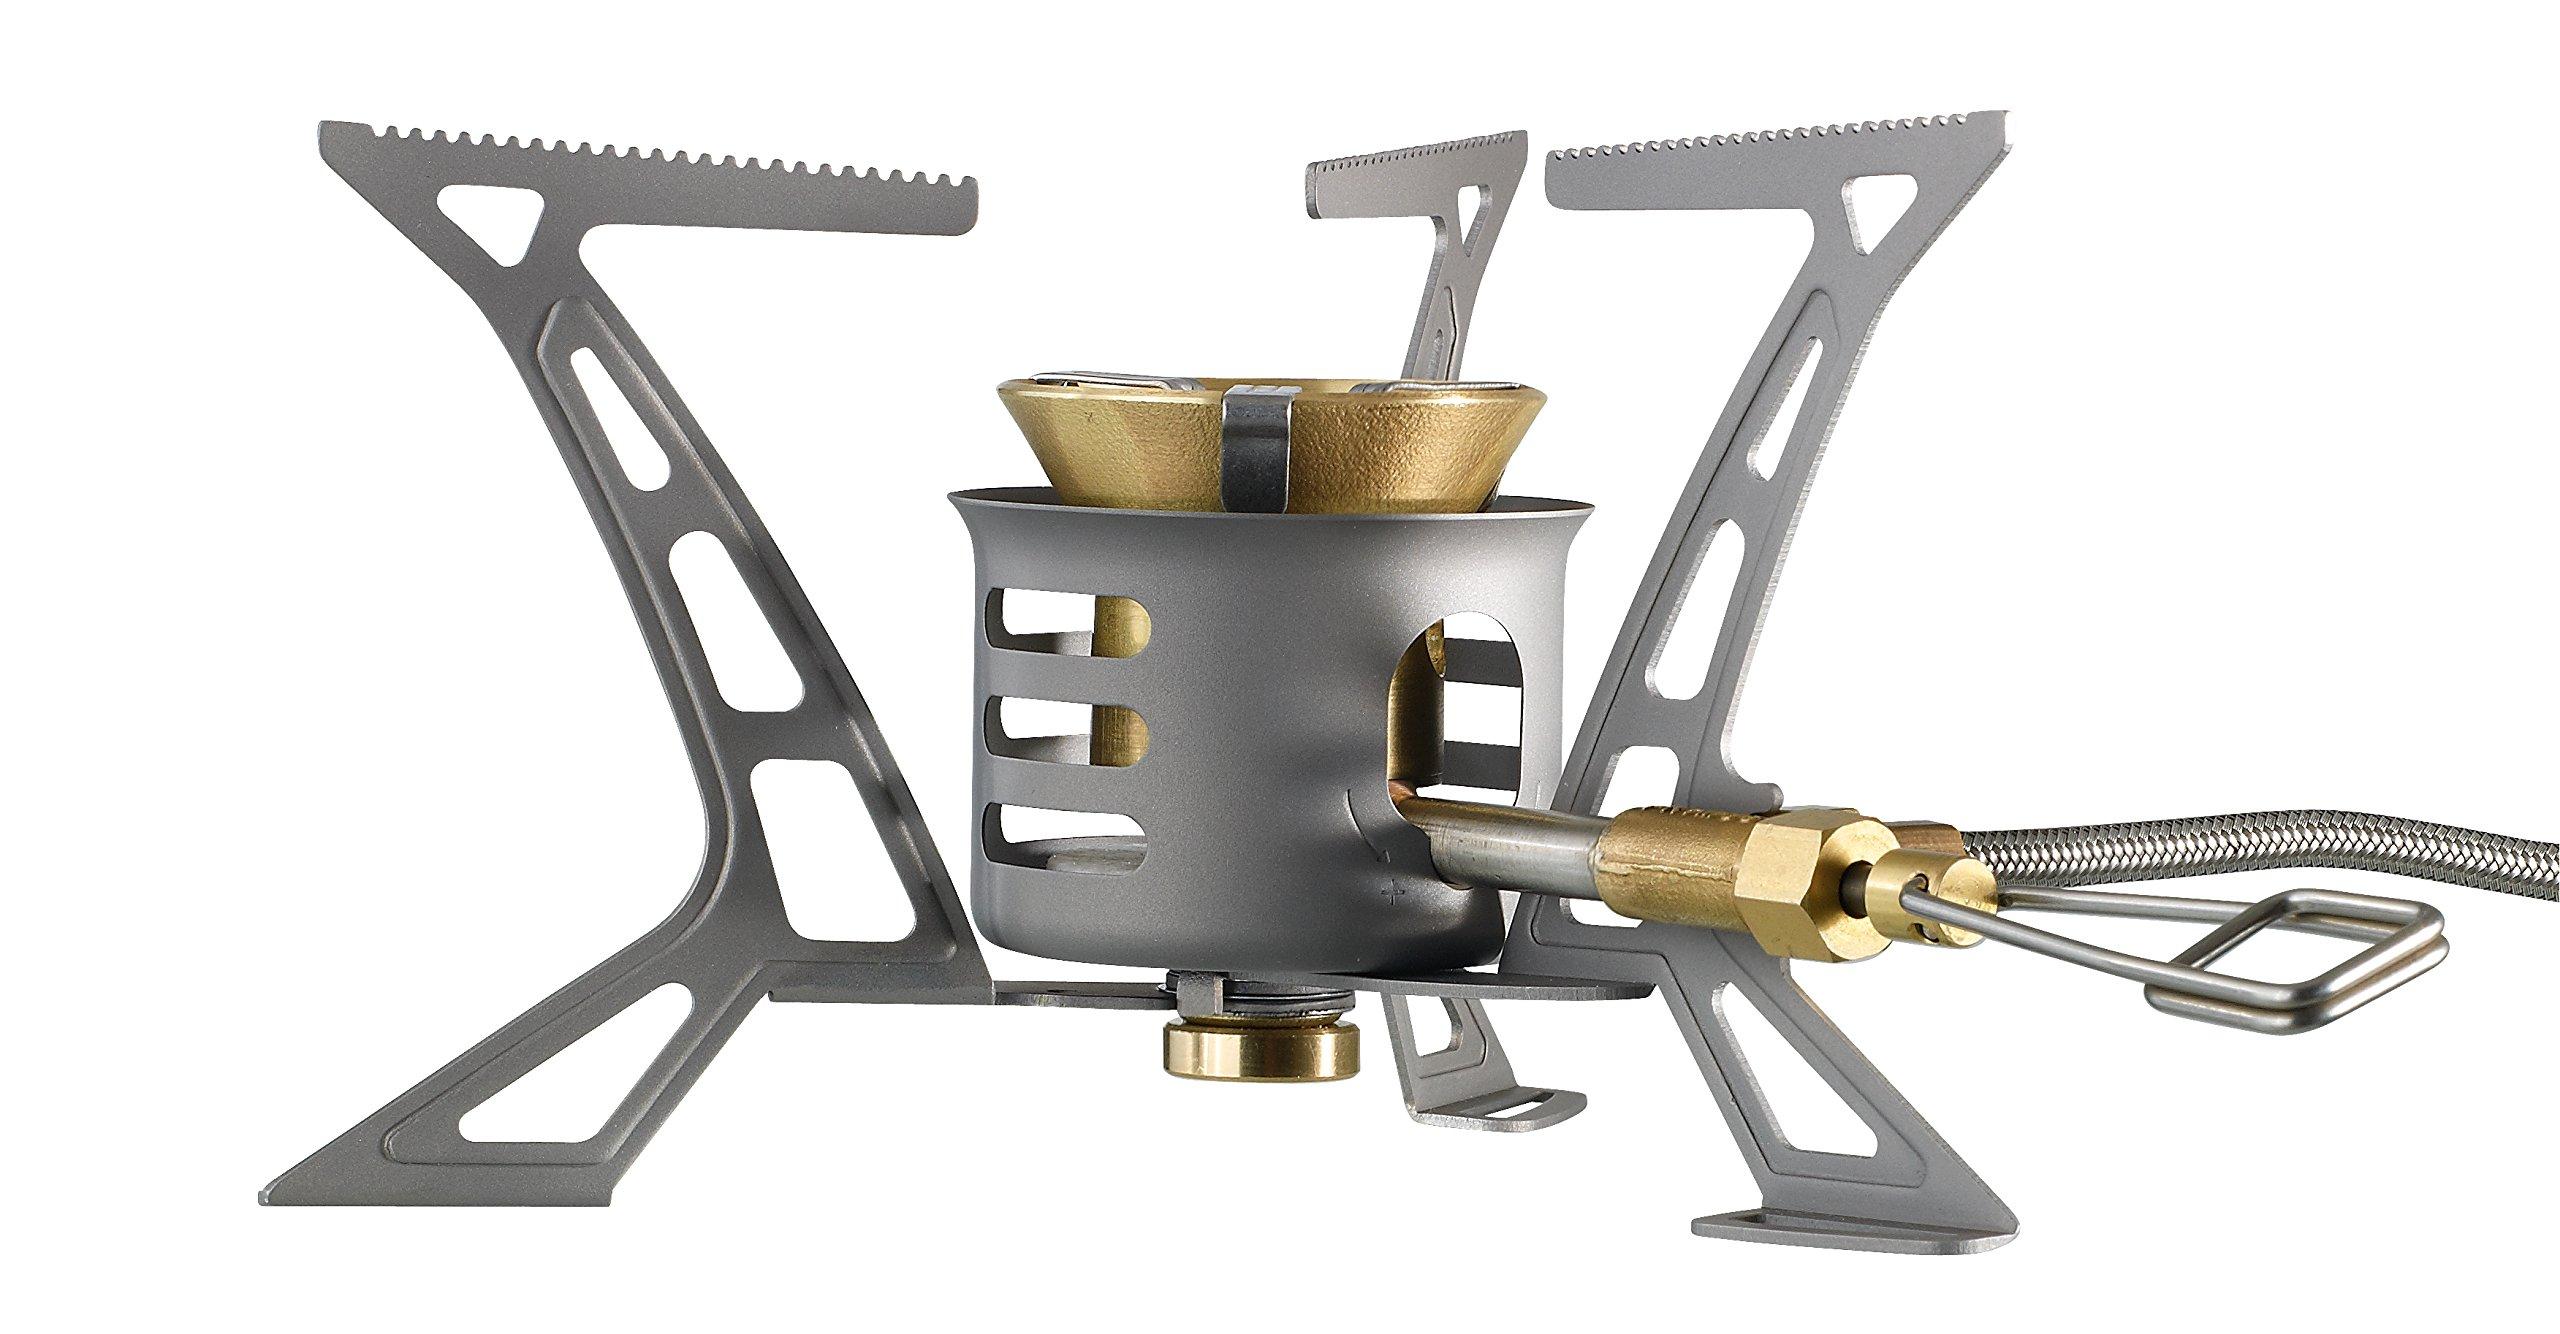 Primus OmniLite TI camping stove grey camping stove by Primus (Image #5)